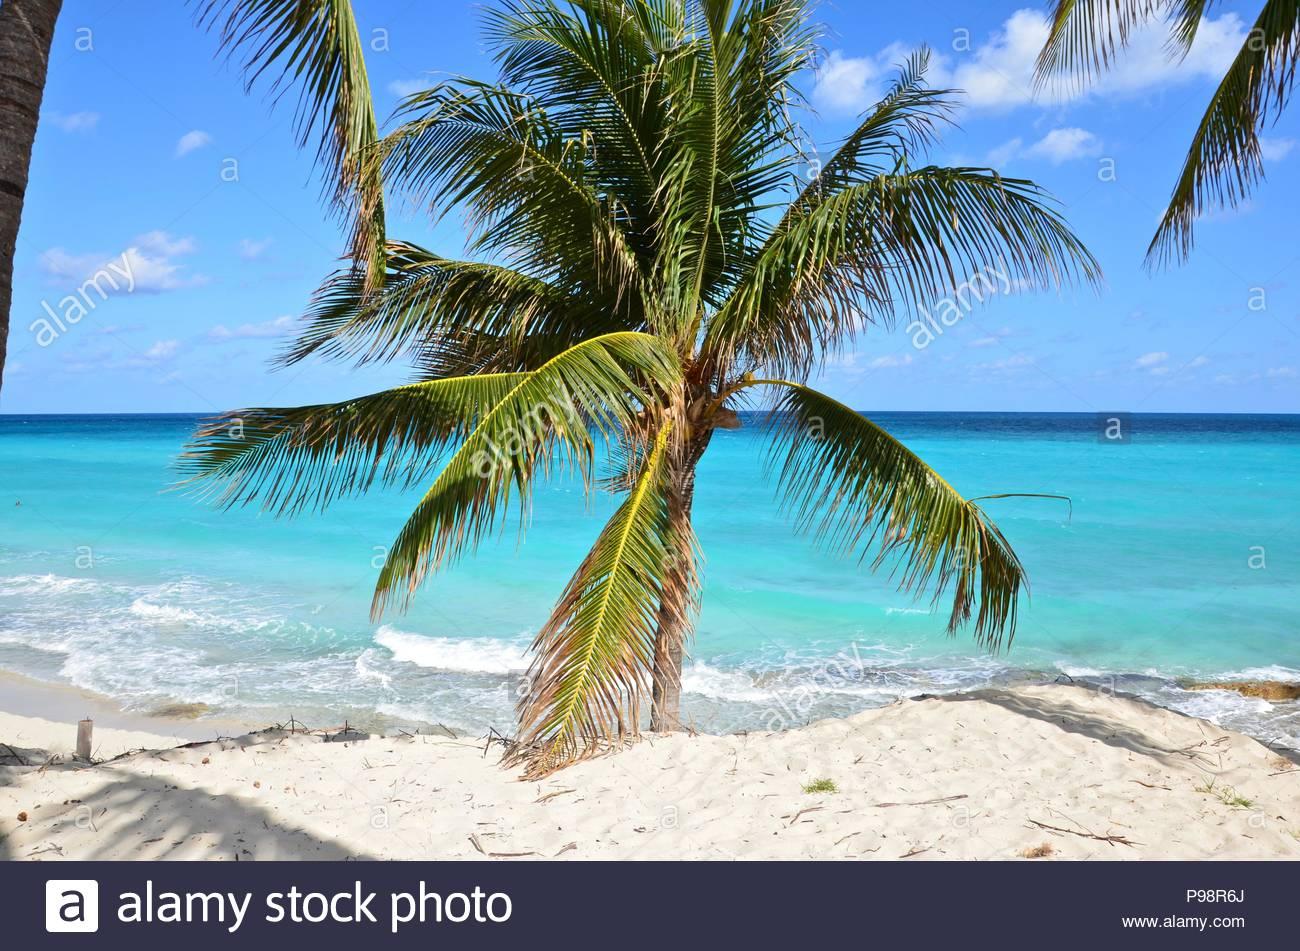 Palm Tree On The Beach Of Varadero Cuba Caribbean Sea Turquoise Water Sunshine